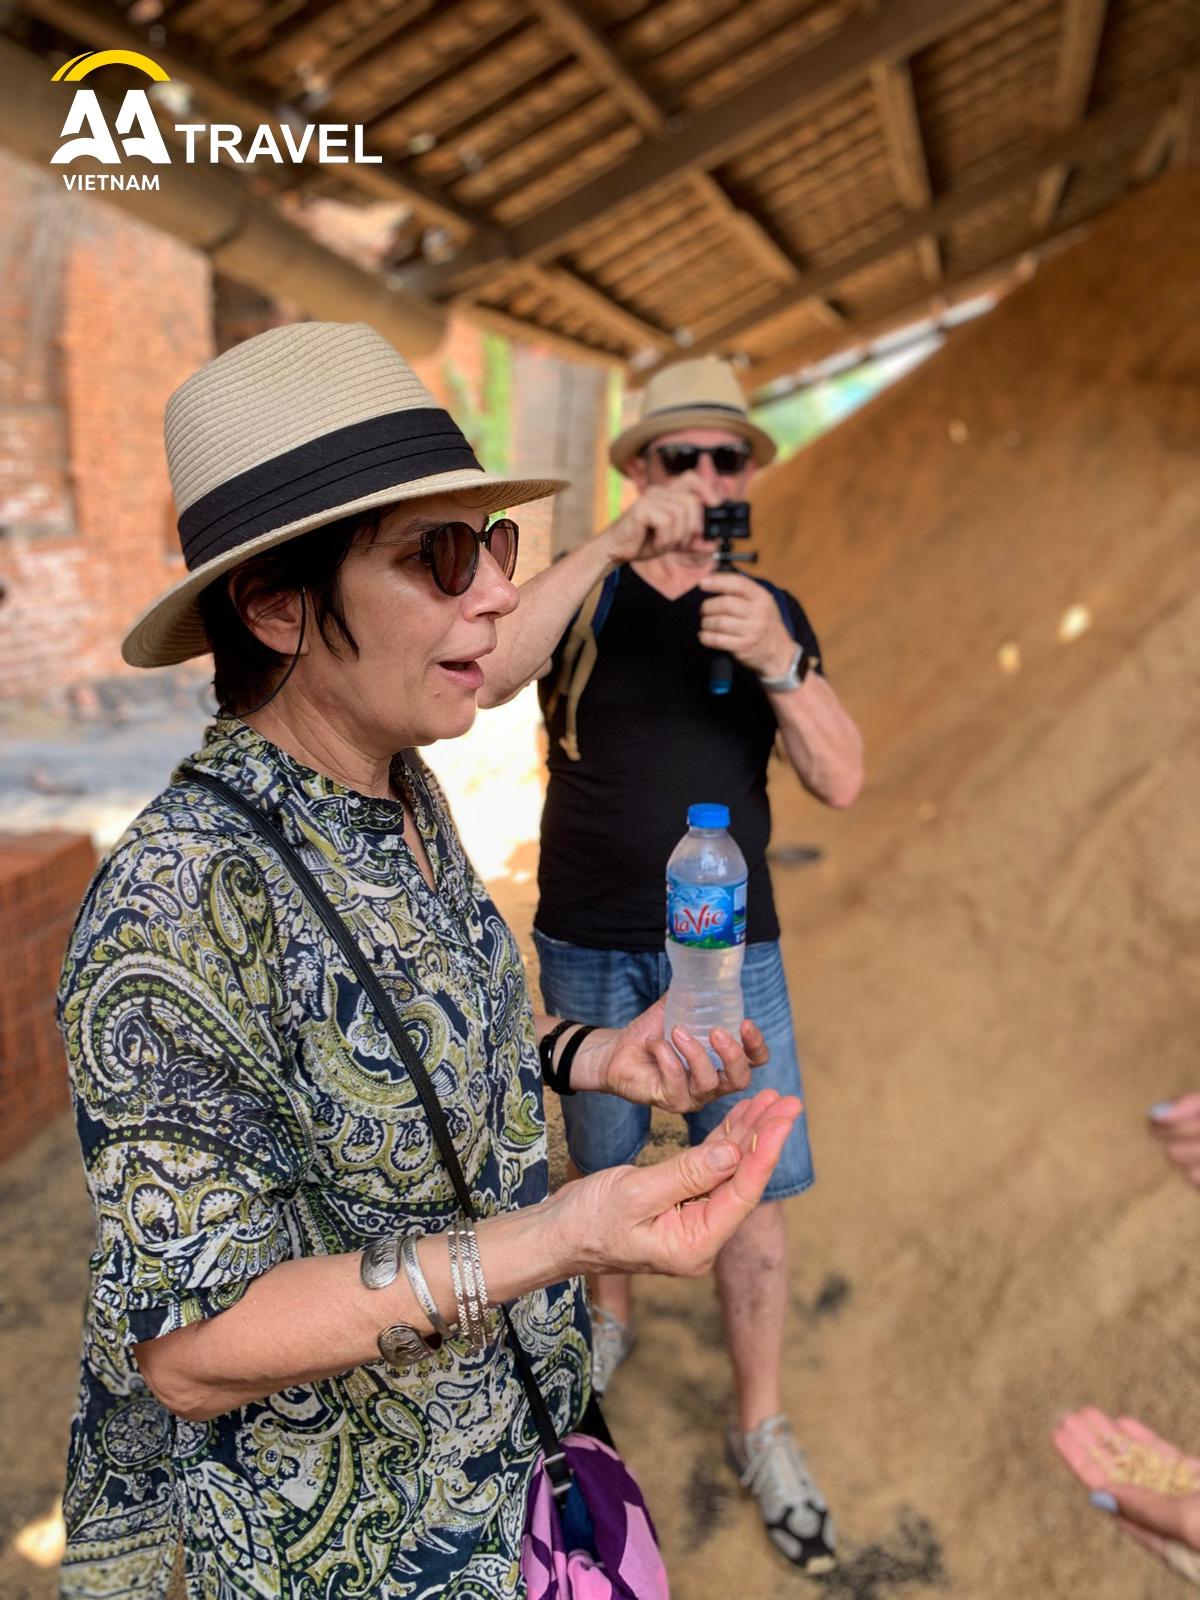 Mr. Yan Martinez and family visit Mekong river